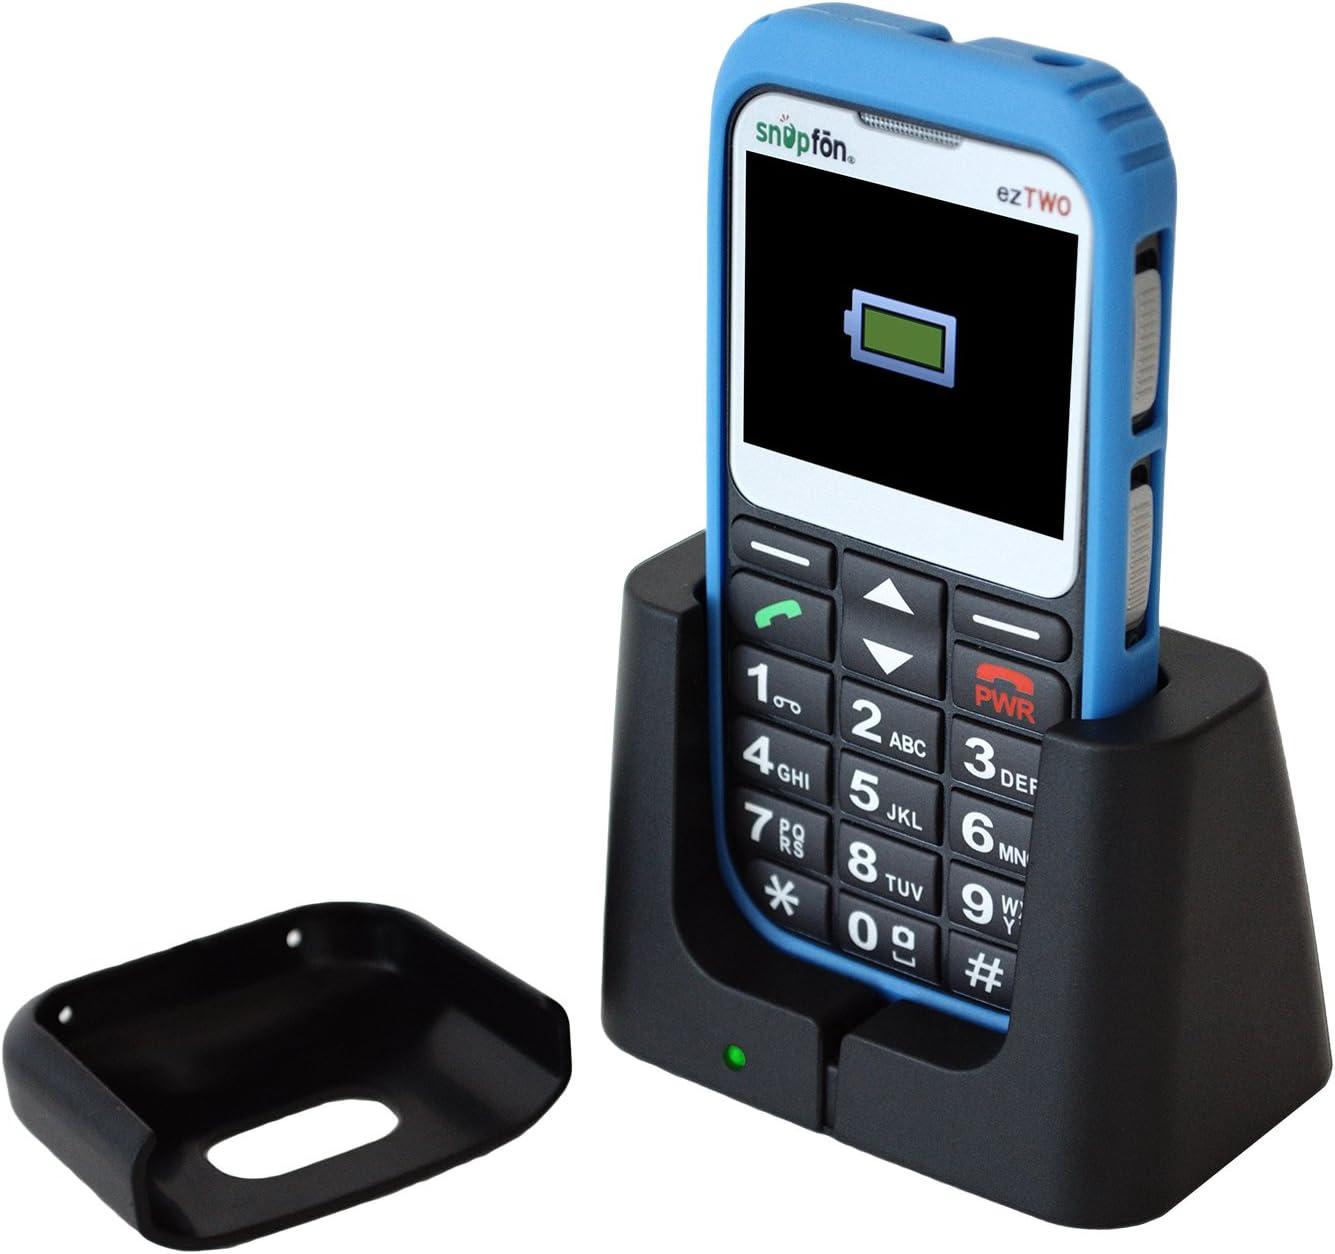 BoxWave Snapfon EzTWO Car Charger, Car Charger and Integrated Cable for Snapfon EzTWO Car Charger Plus Black